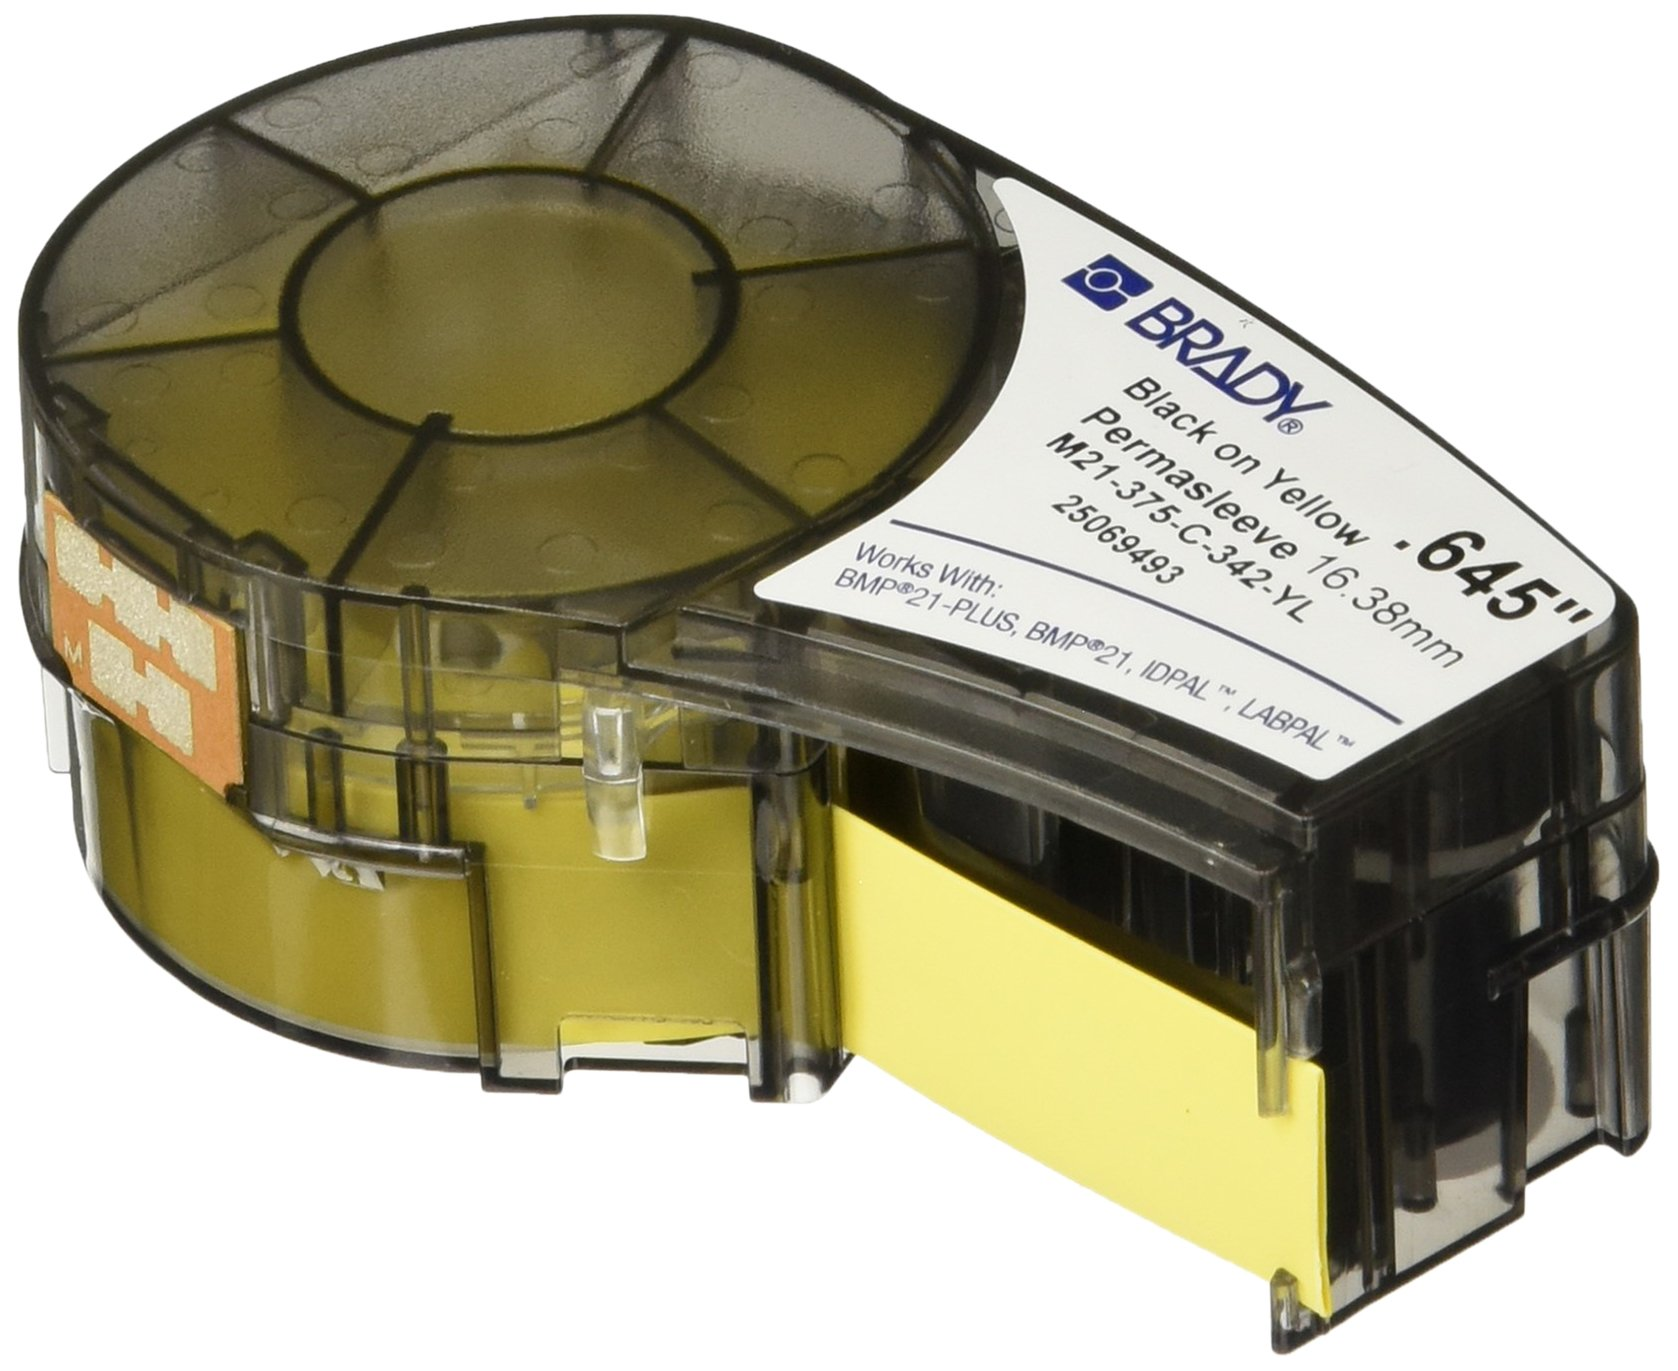 Brady M21-375-C-342-YL Cartridge, B342 Permasleeve Material .375'' W x 7' L, Yellow